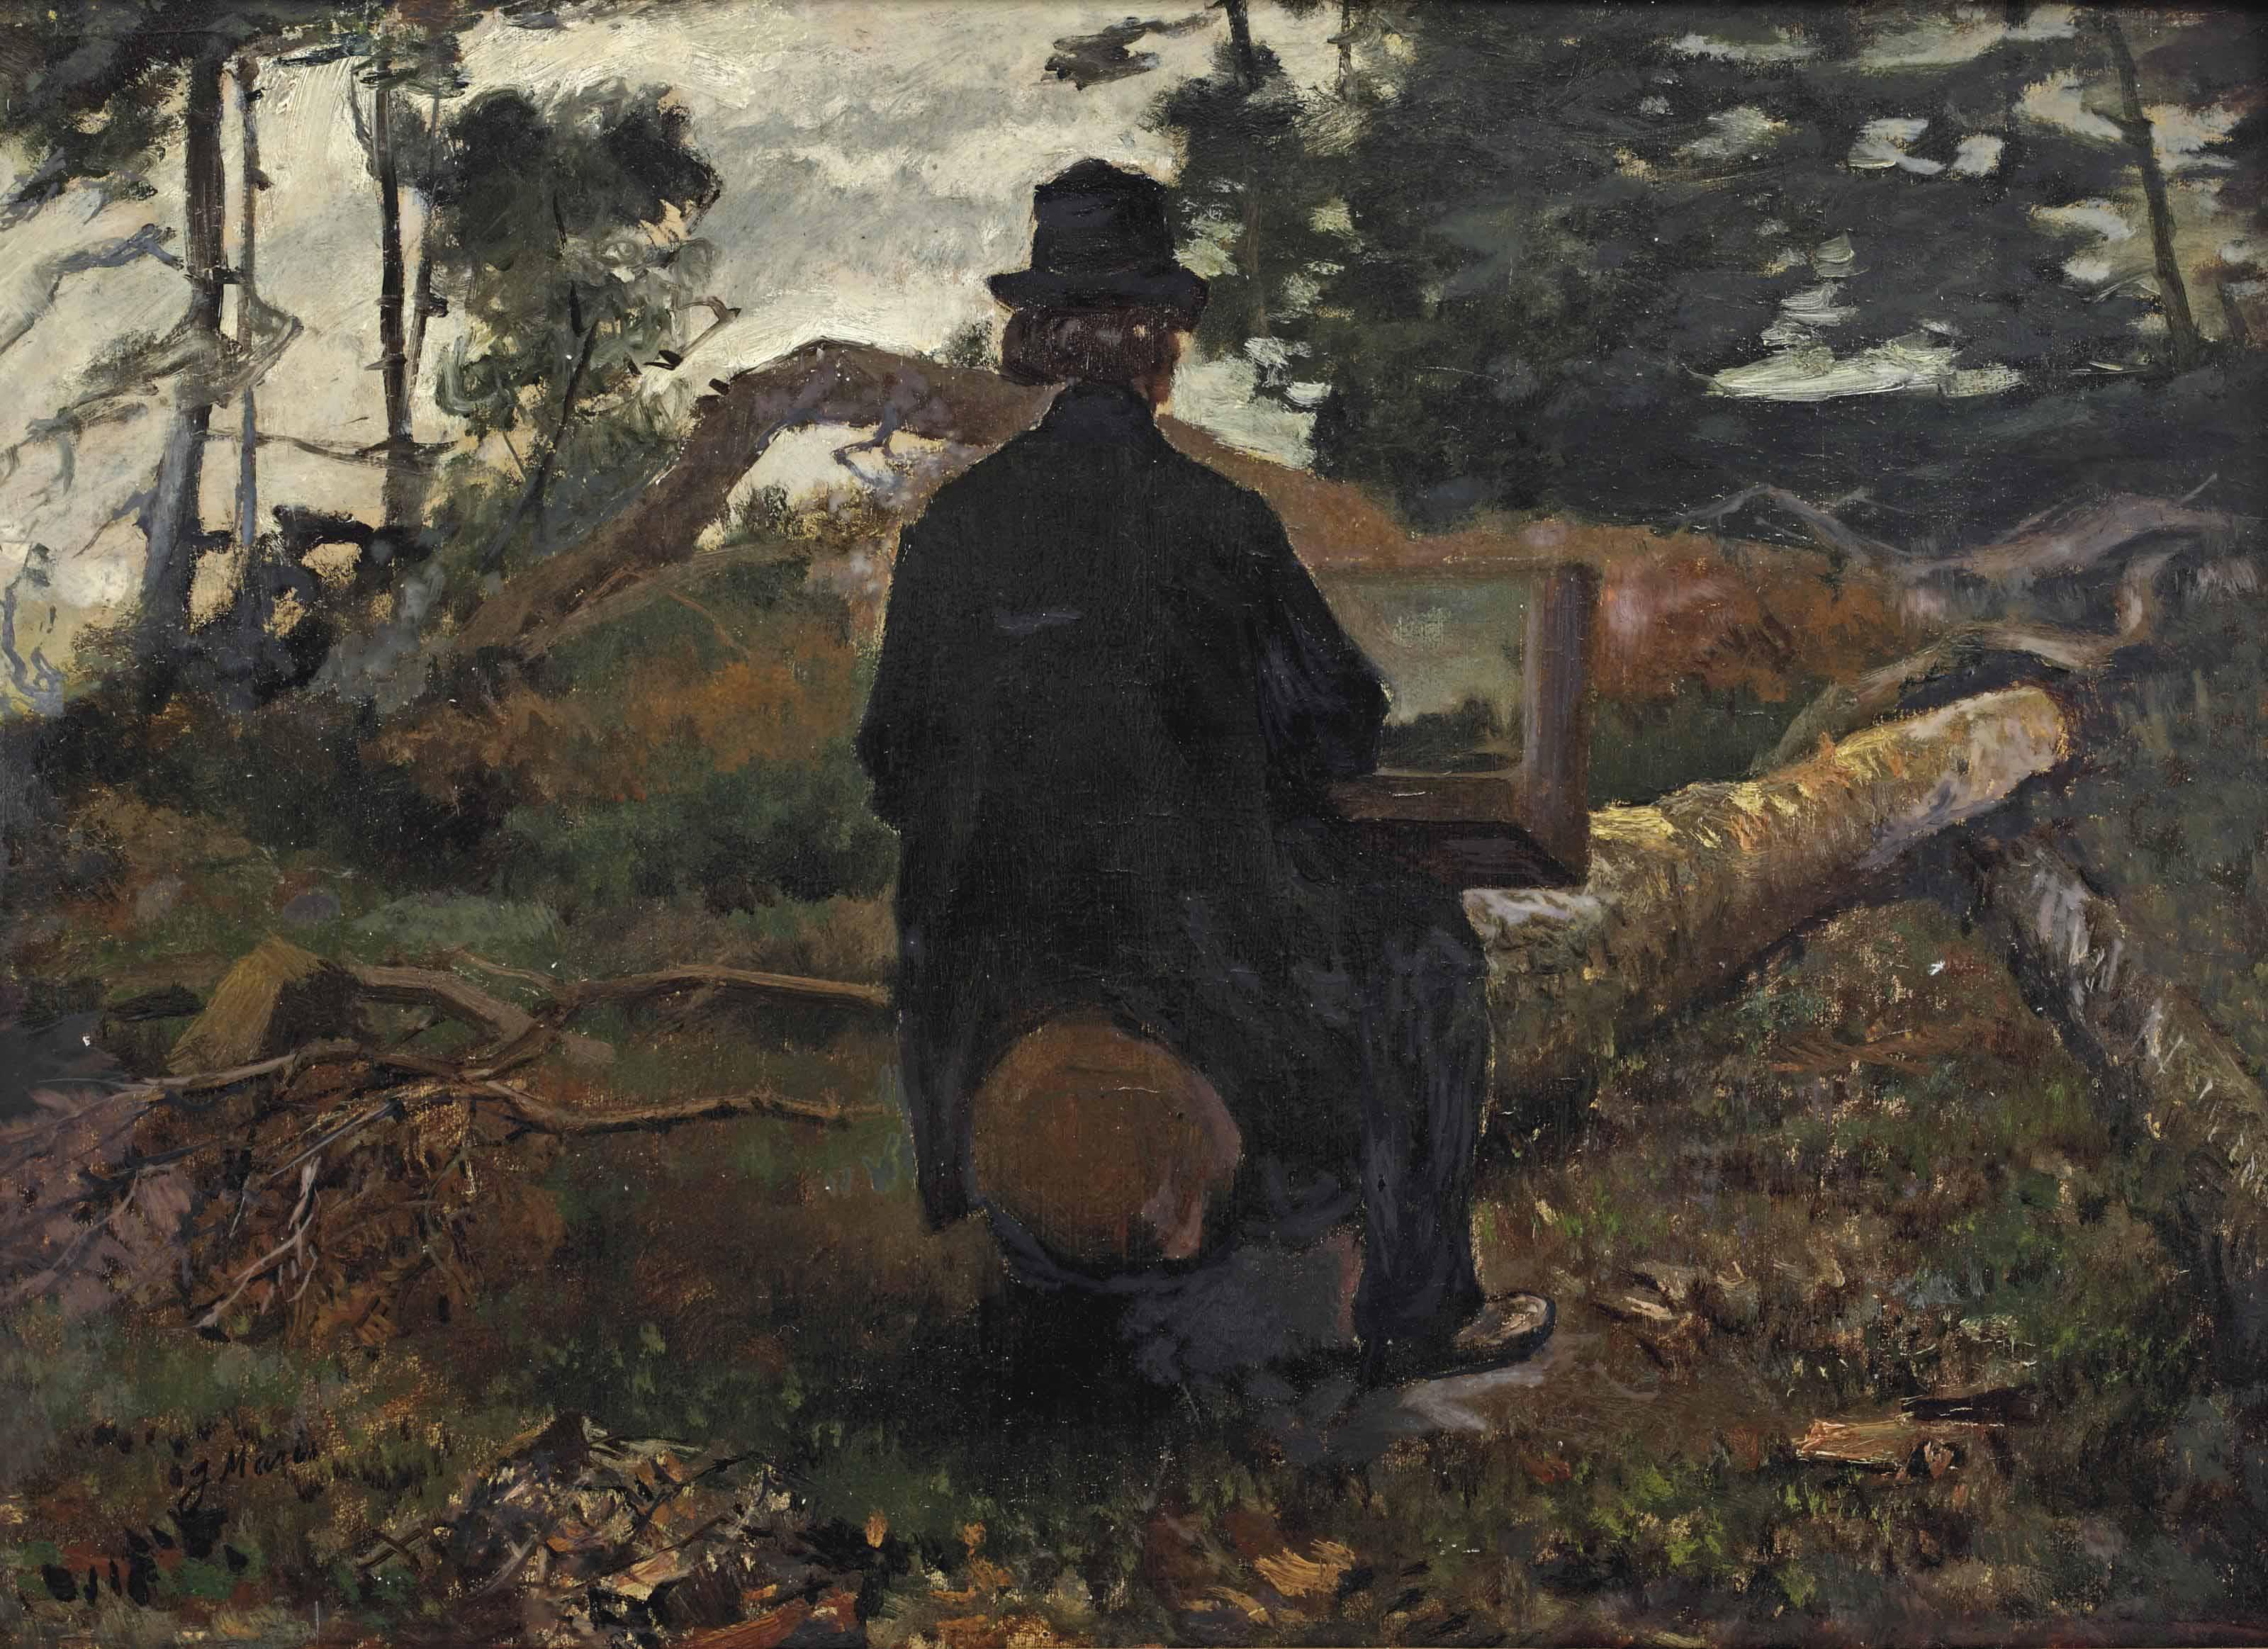 Jacob Maris (The Hague 1837-1899 Karlsbad)